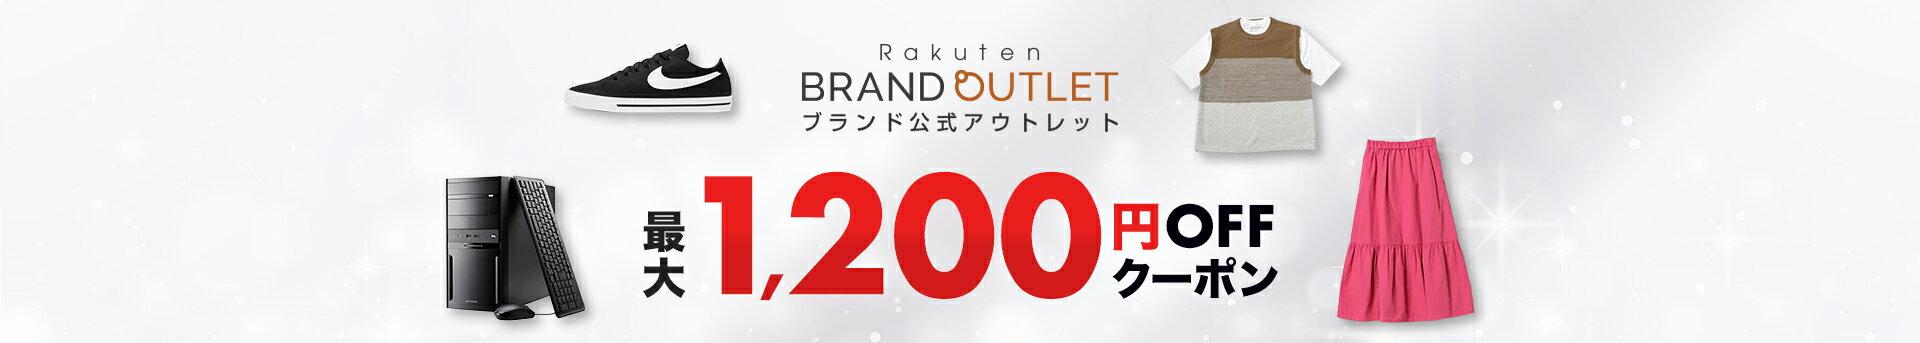 Rakuten BRAND OUTLET  最大1,200円OFFクーポン